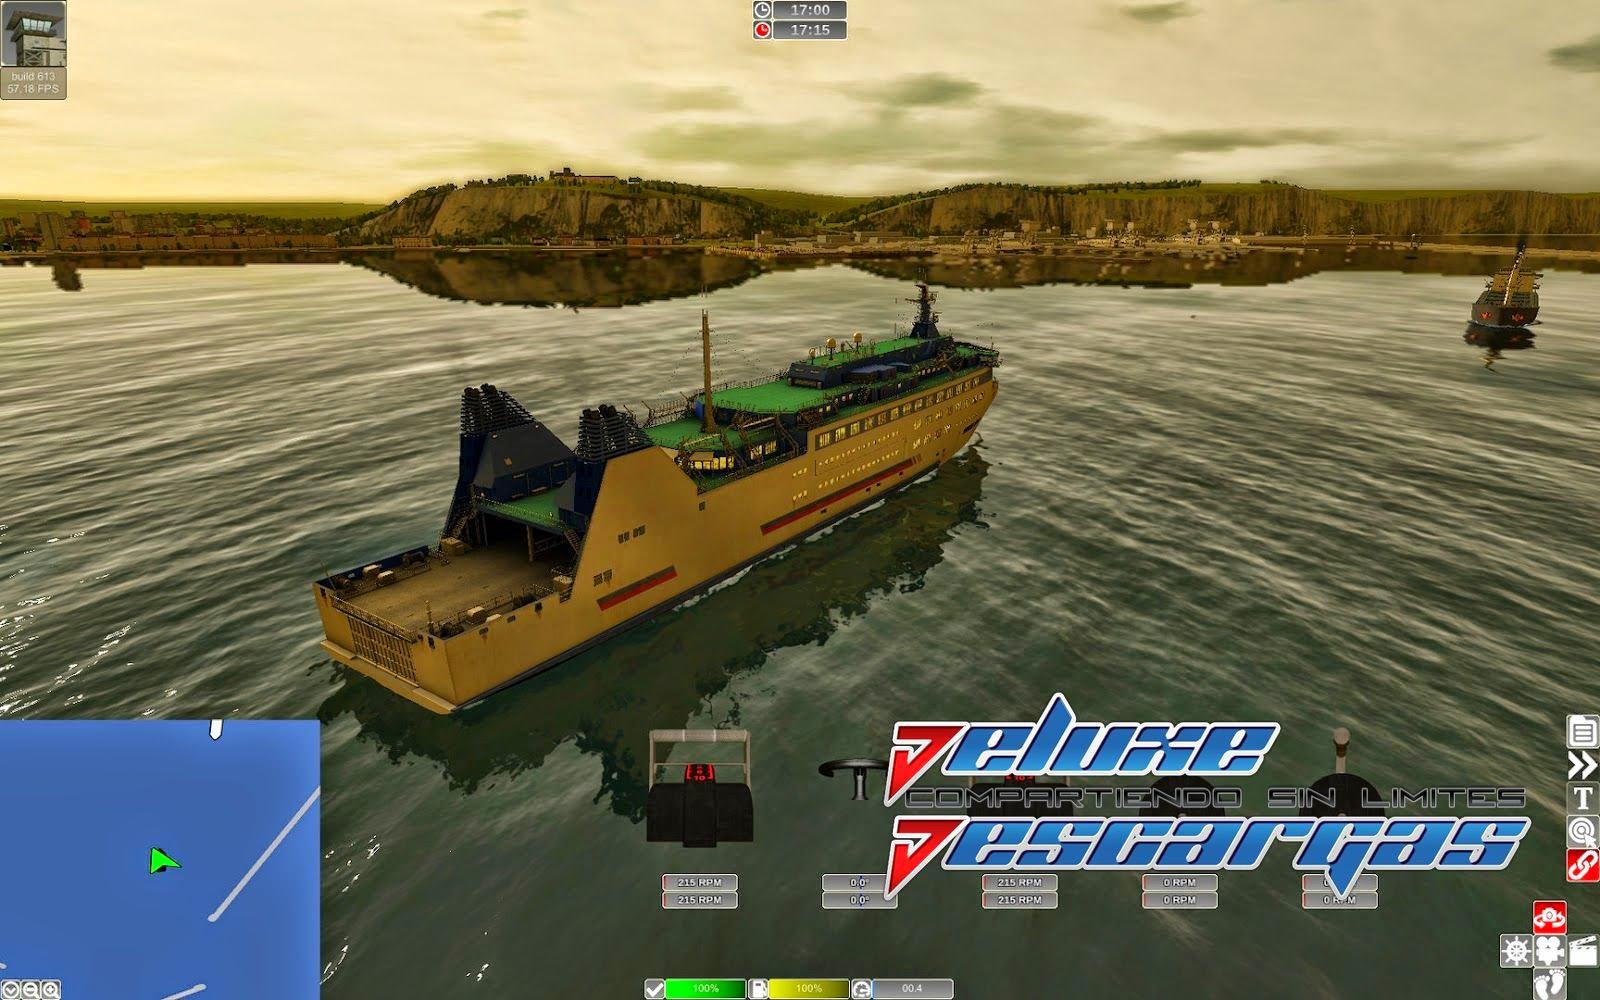 European_Ship_Simulator-www.deluxedescargas.com%2B(4).jpg